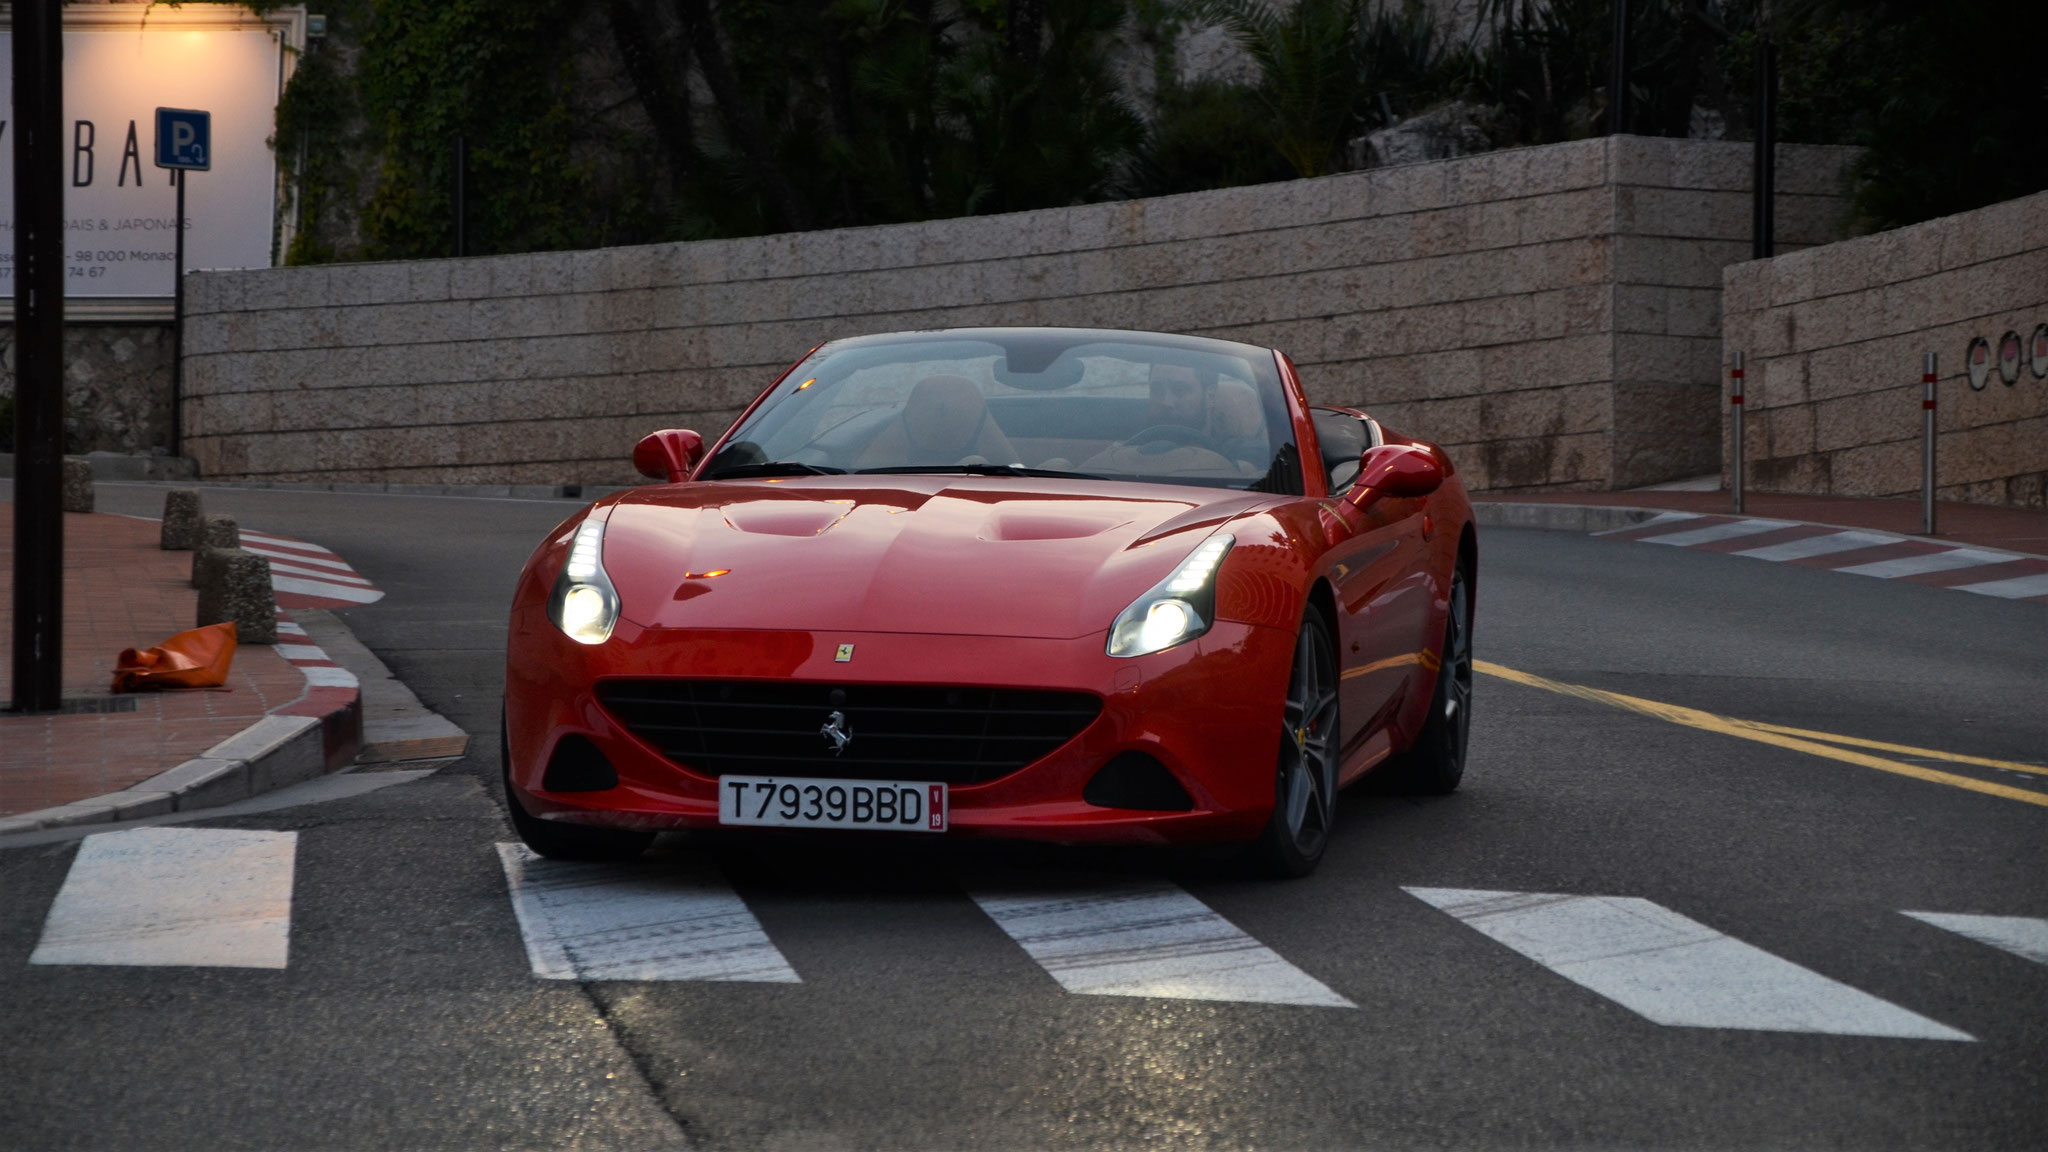 Ferrari California T - T7939BBD (?)